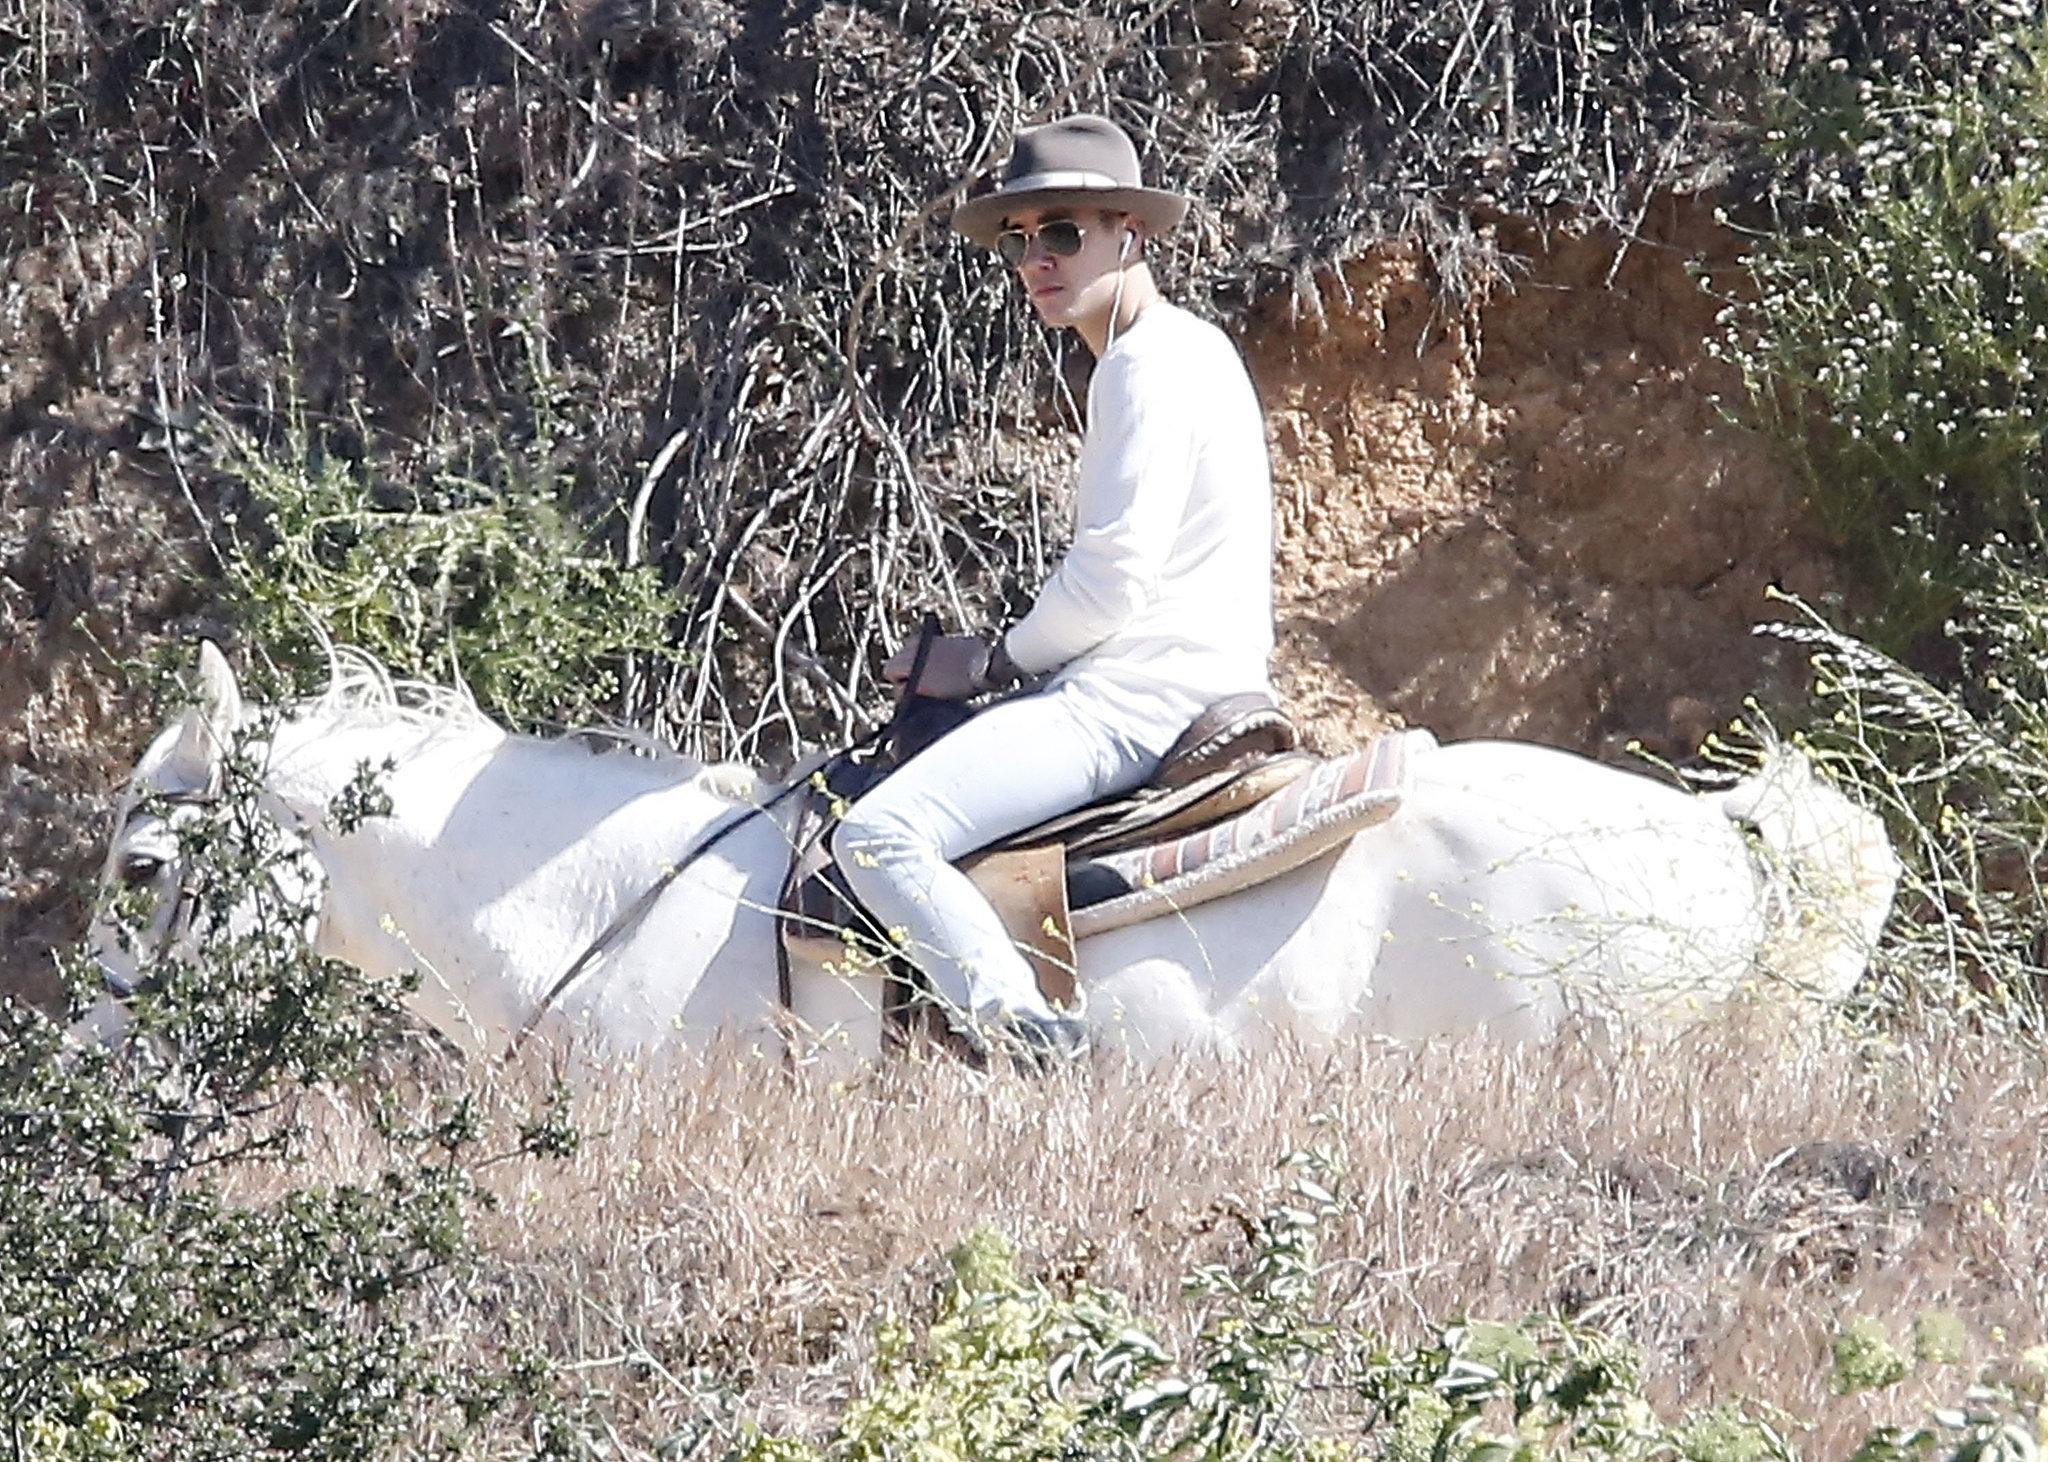 Justin Bieber Goes For a Shirtless Horseback Ride